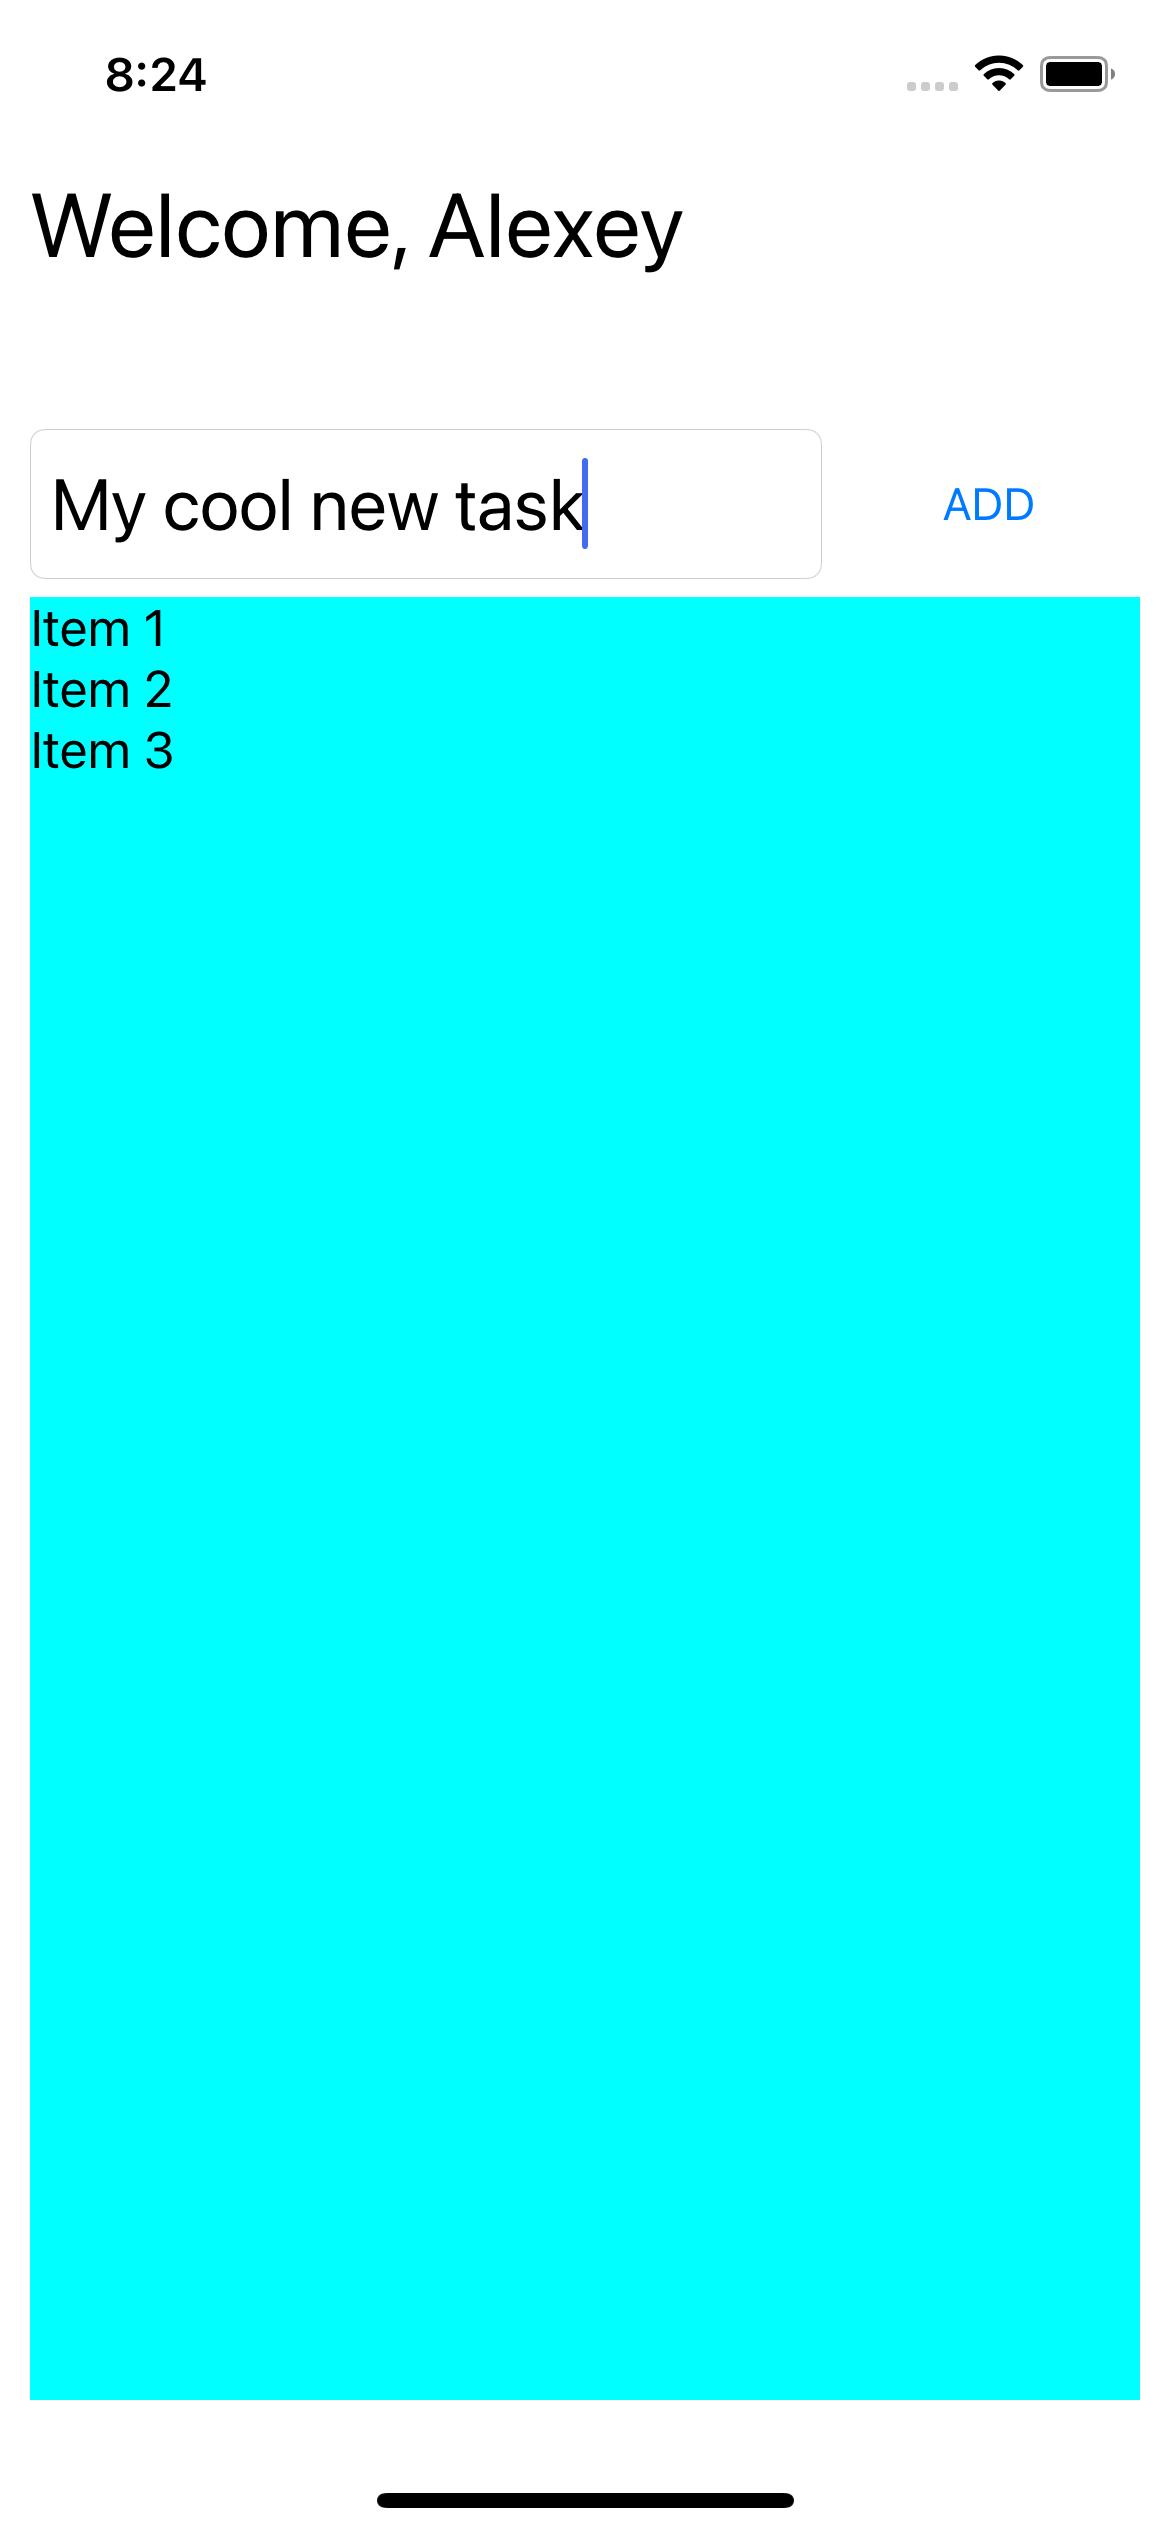 Simulator Screen Shot - iPhone 12 Pro - 2021-05-18 at 20 24 36